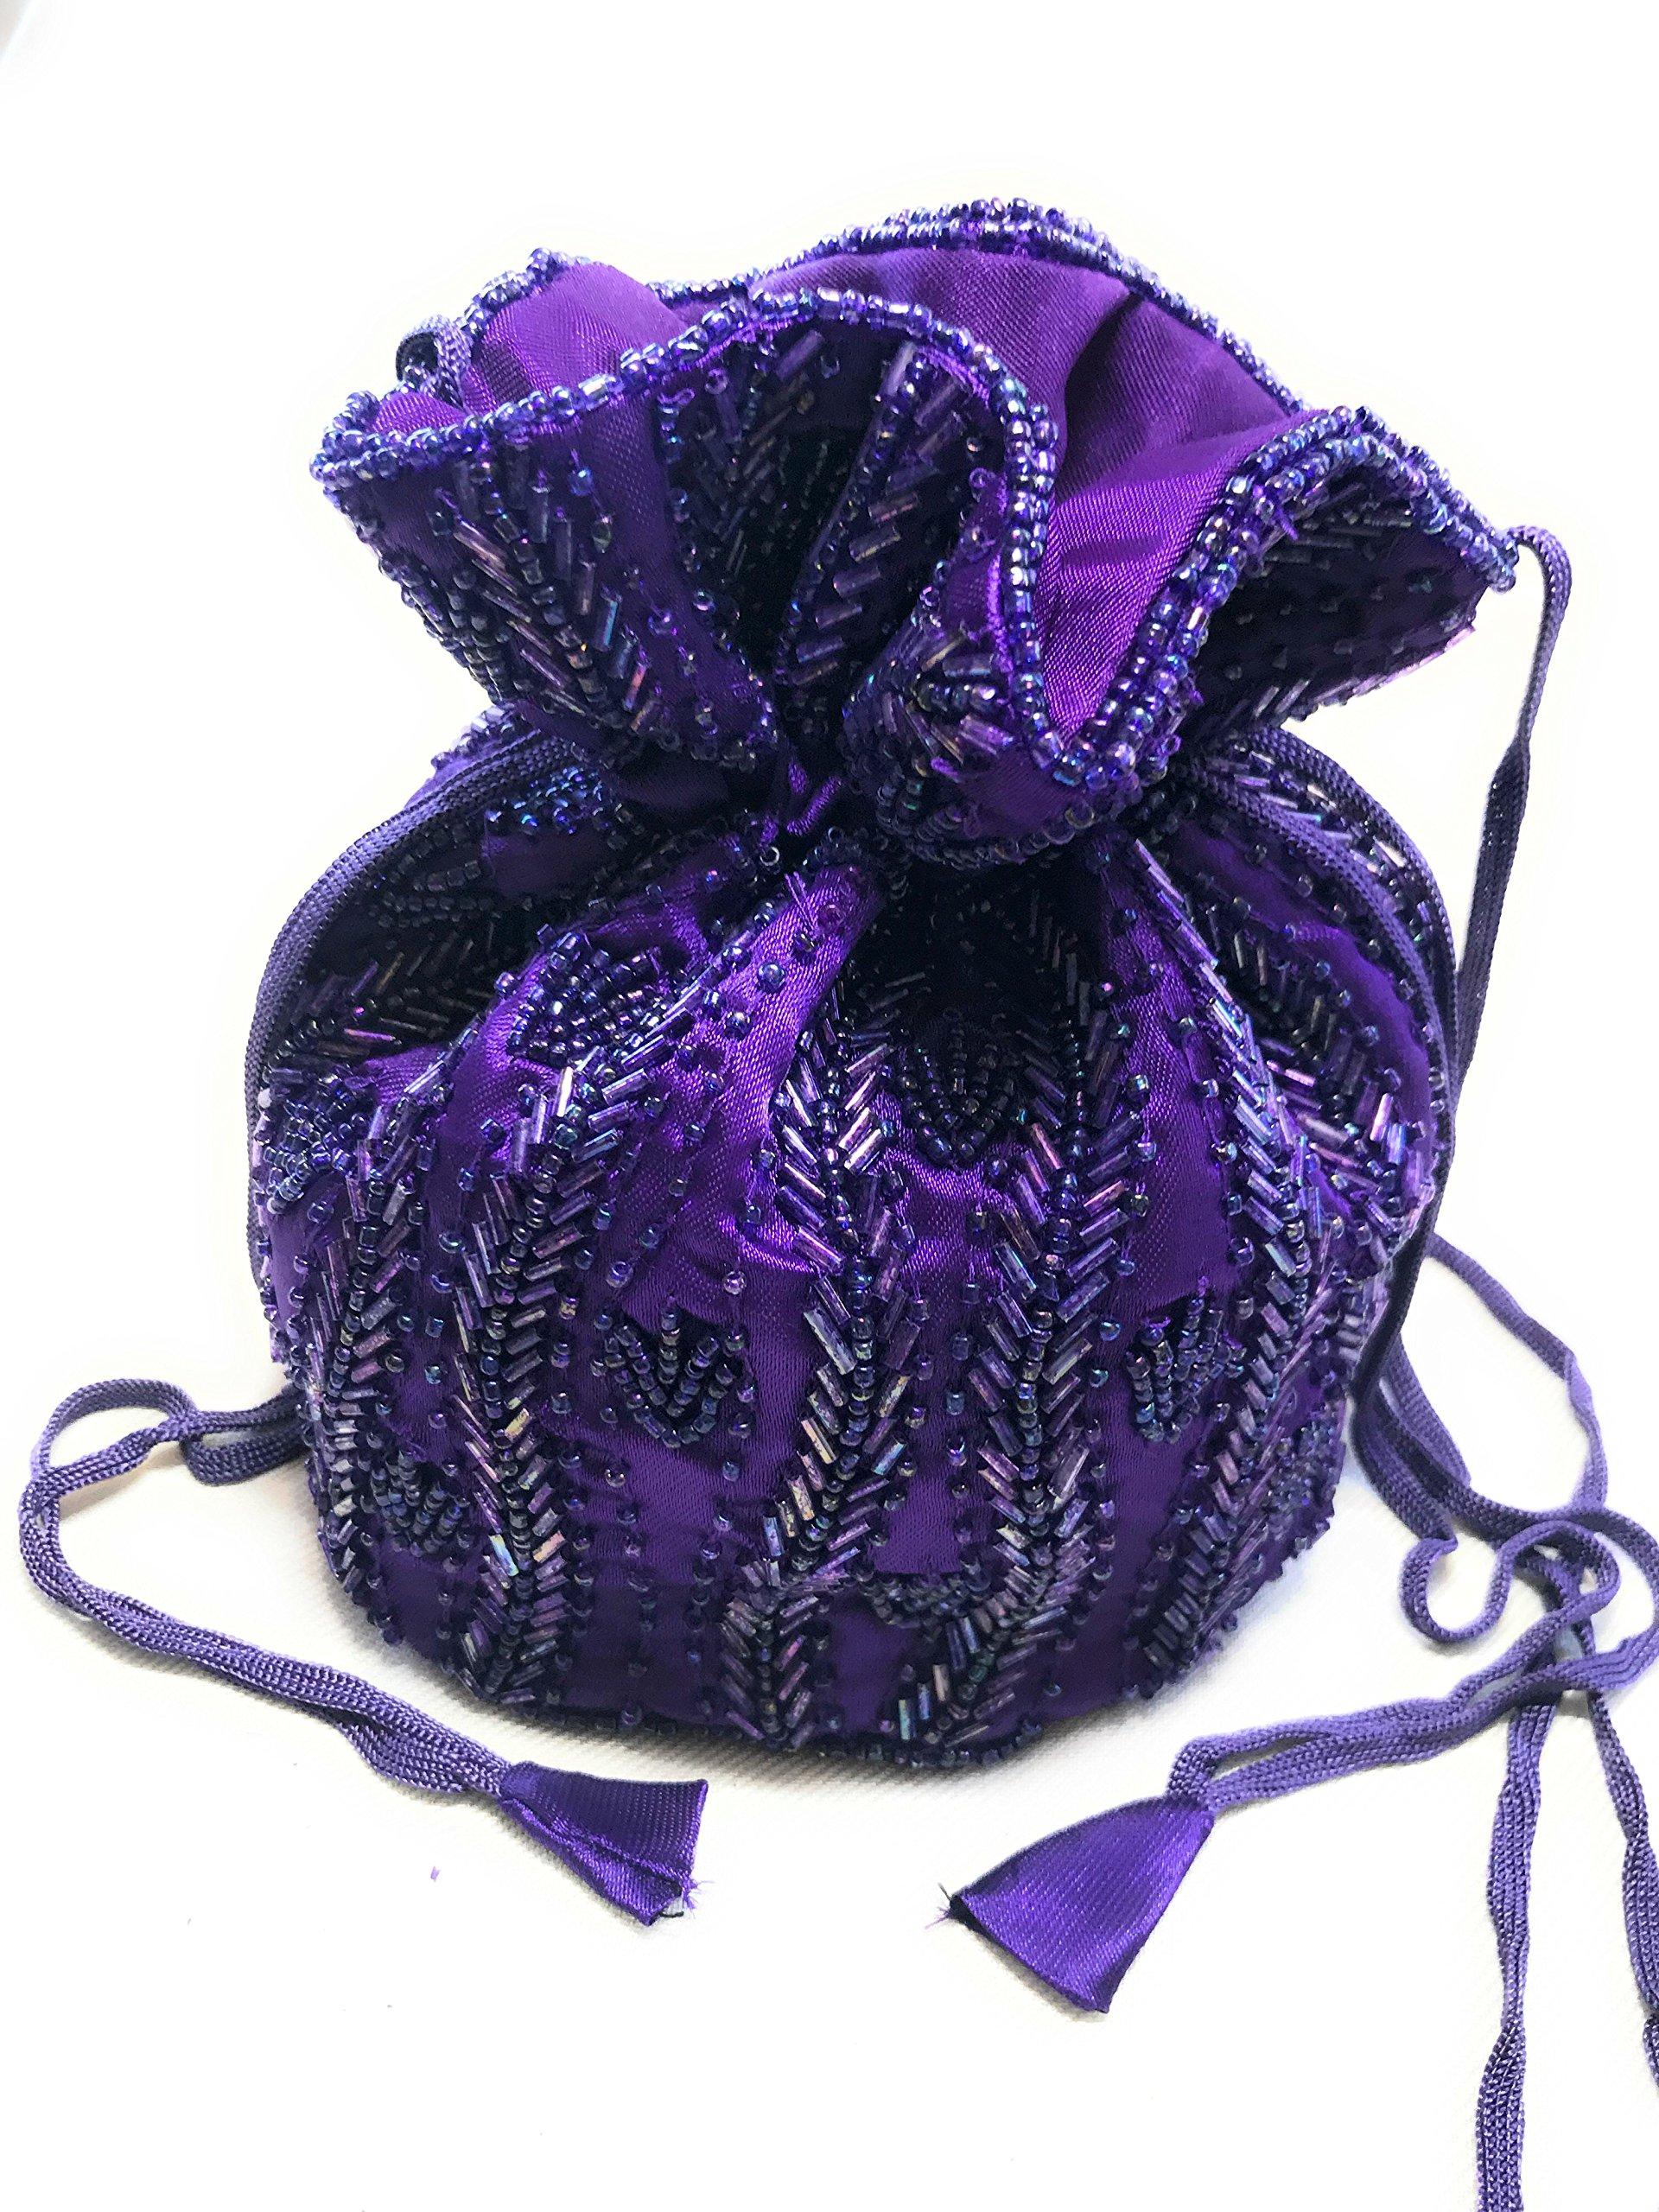 Beaded Potli Bag Handmade Indian Party Wedding Drawstring Pouch Purse (purple)